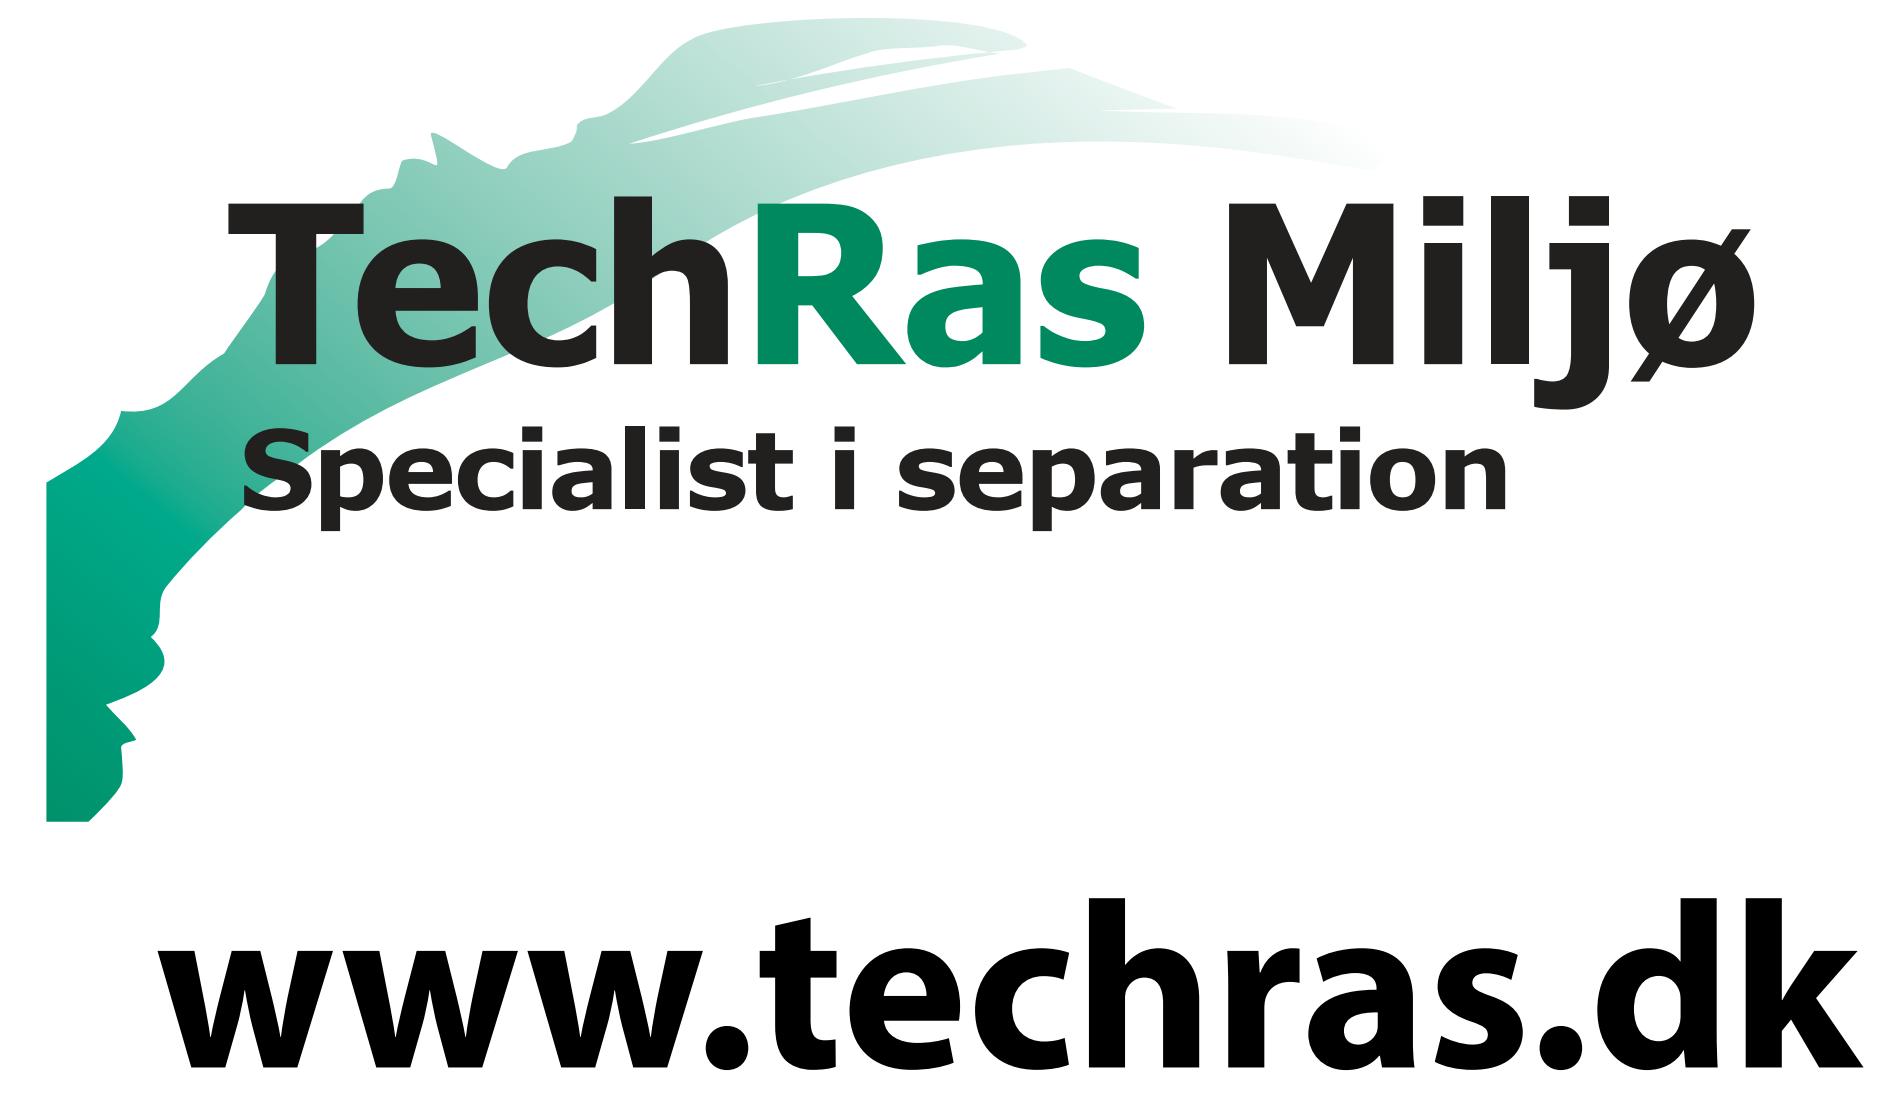 Techras logo